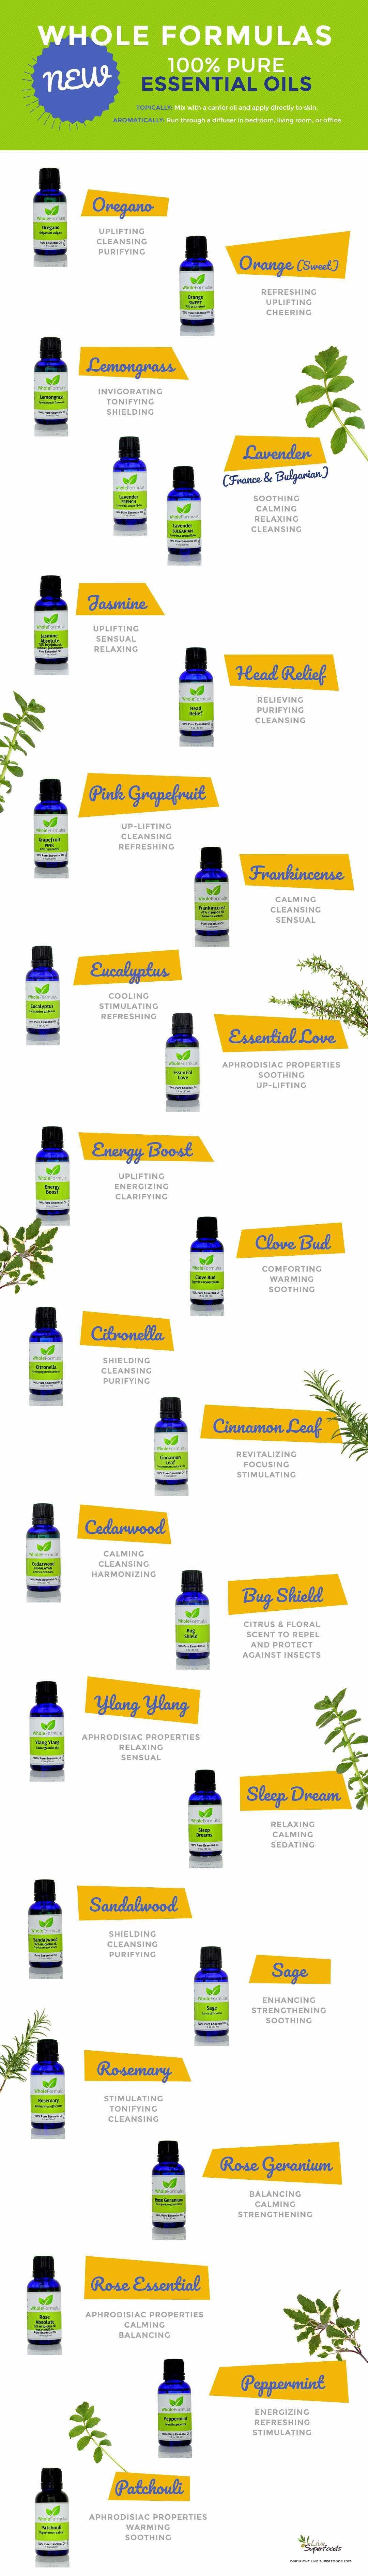 Whole Formulas Essential Oils